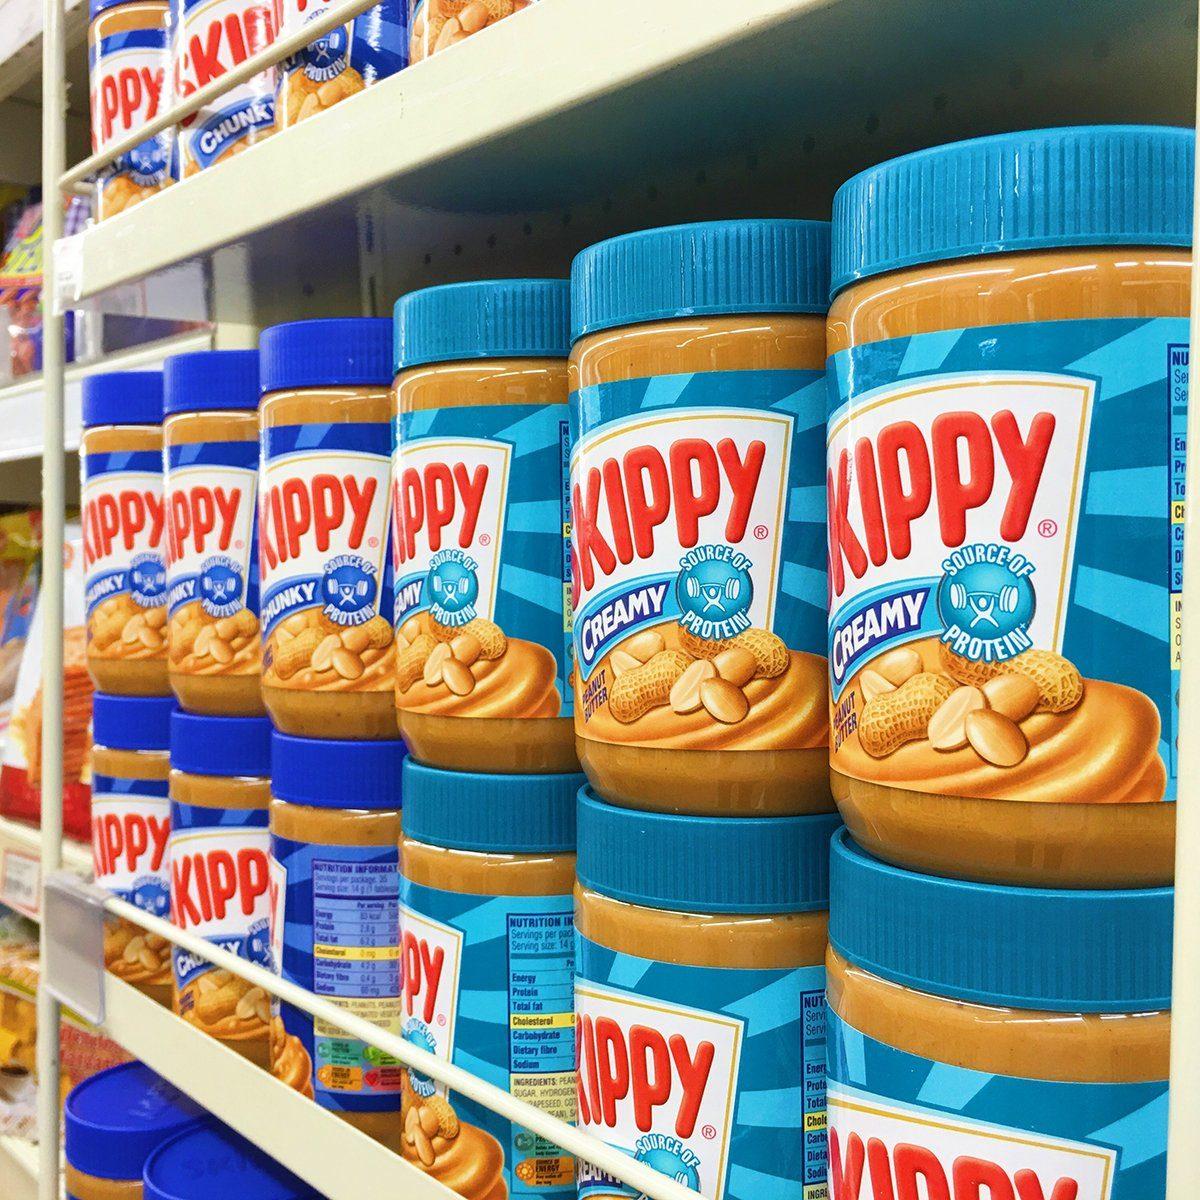 Skippy brand chunky peanut butter